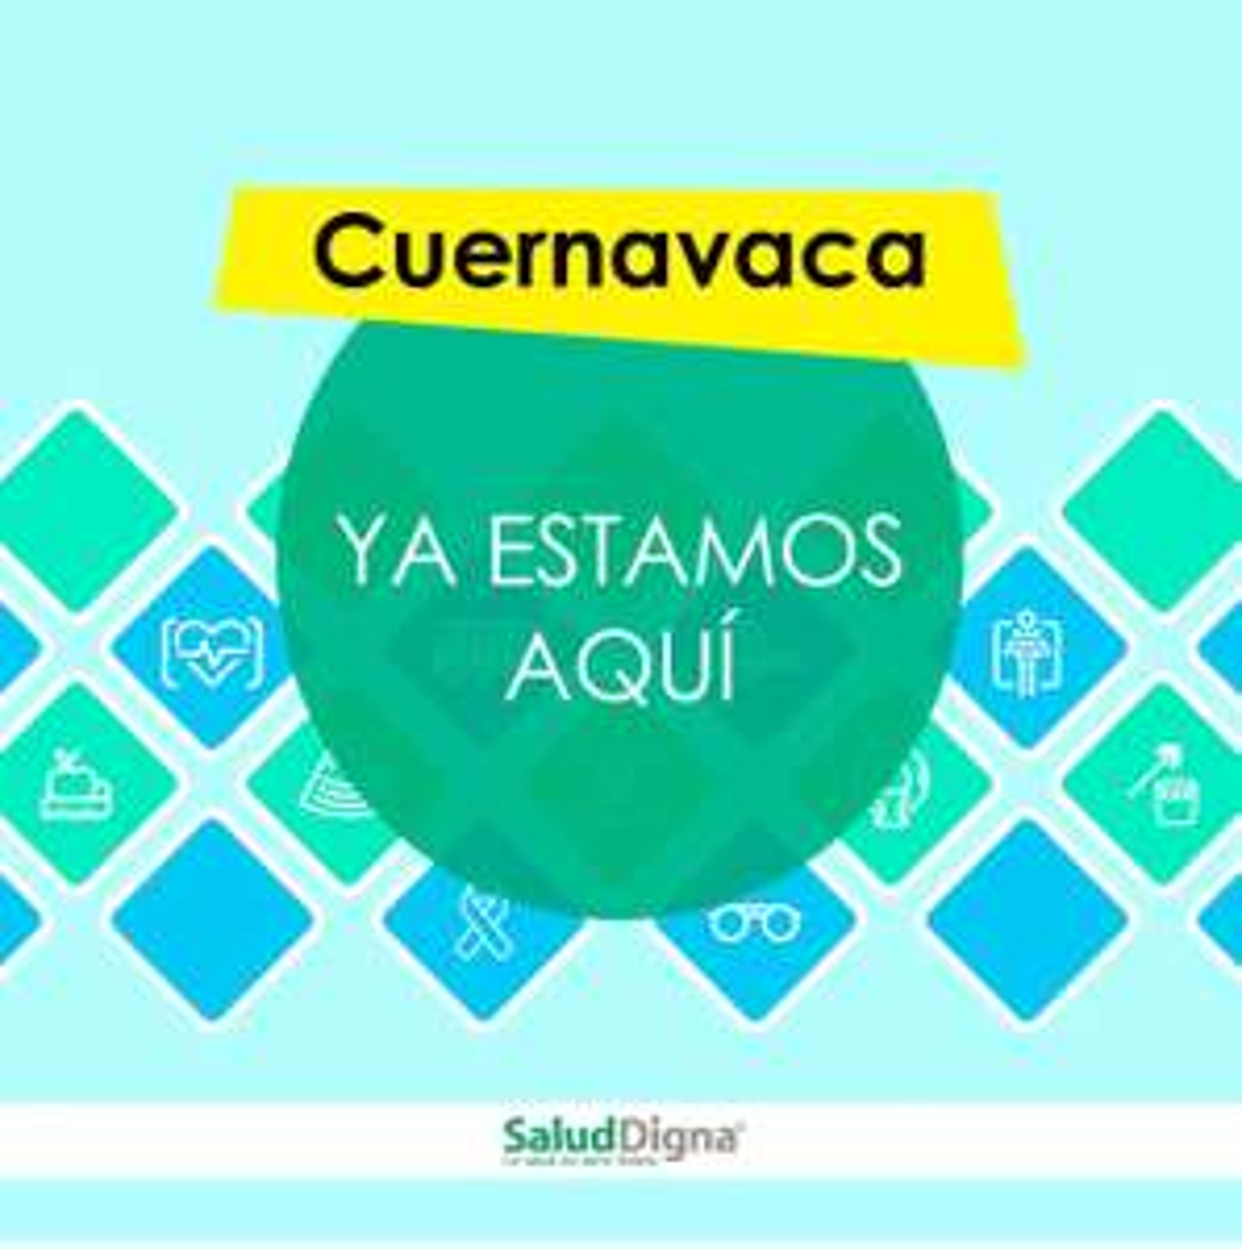 Salud digna Cuernavaca. Estudio a elegir GRATIS.